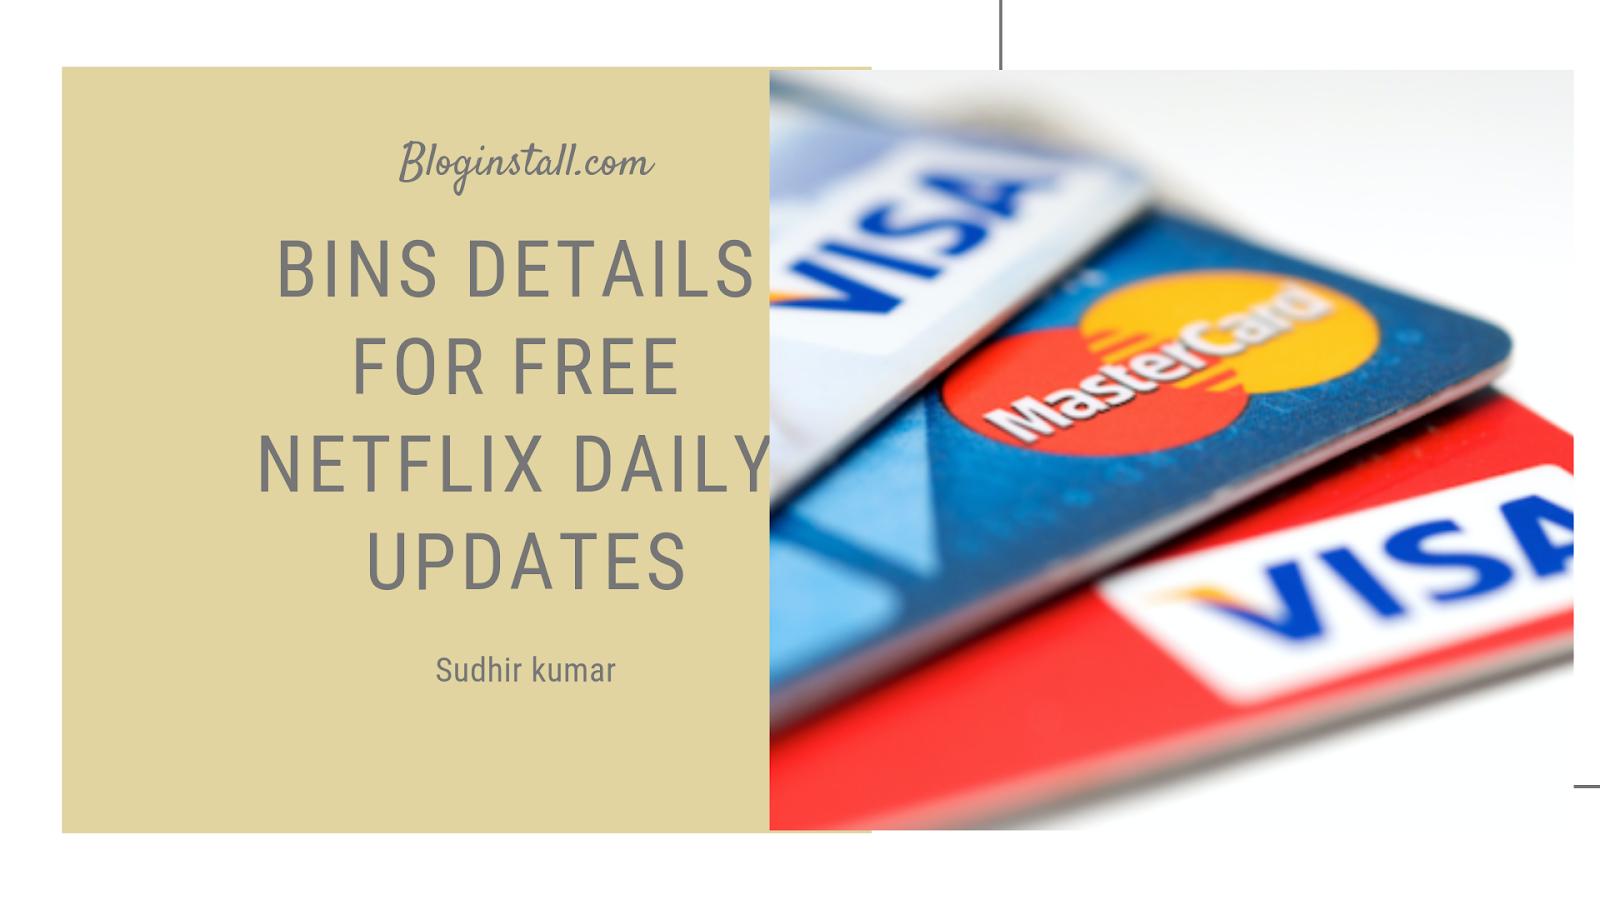 Bin netflix working 26 jan 2019 - Premium Accounts